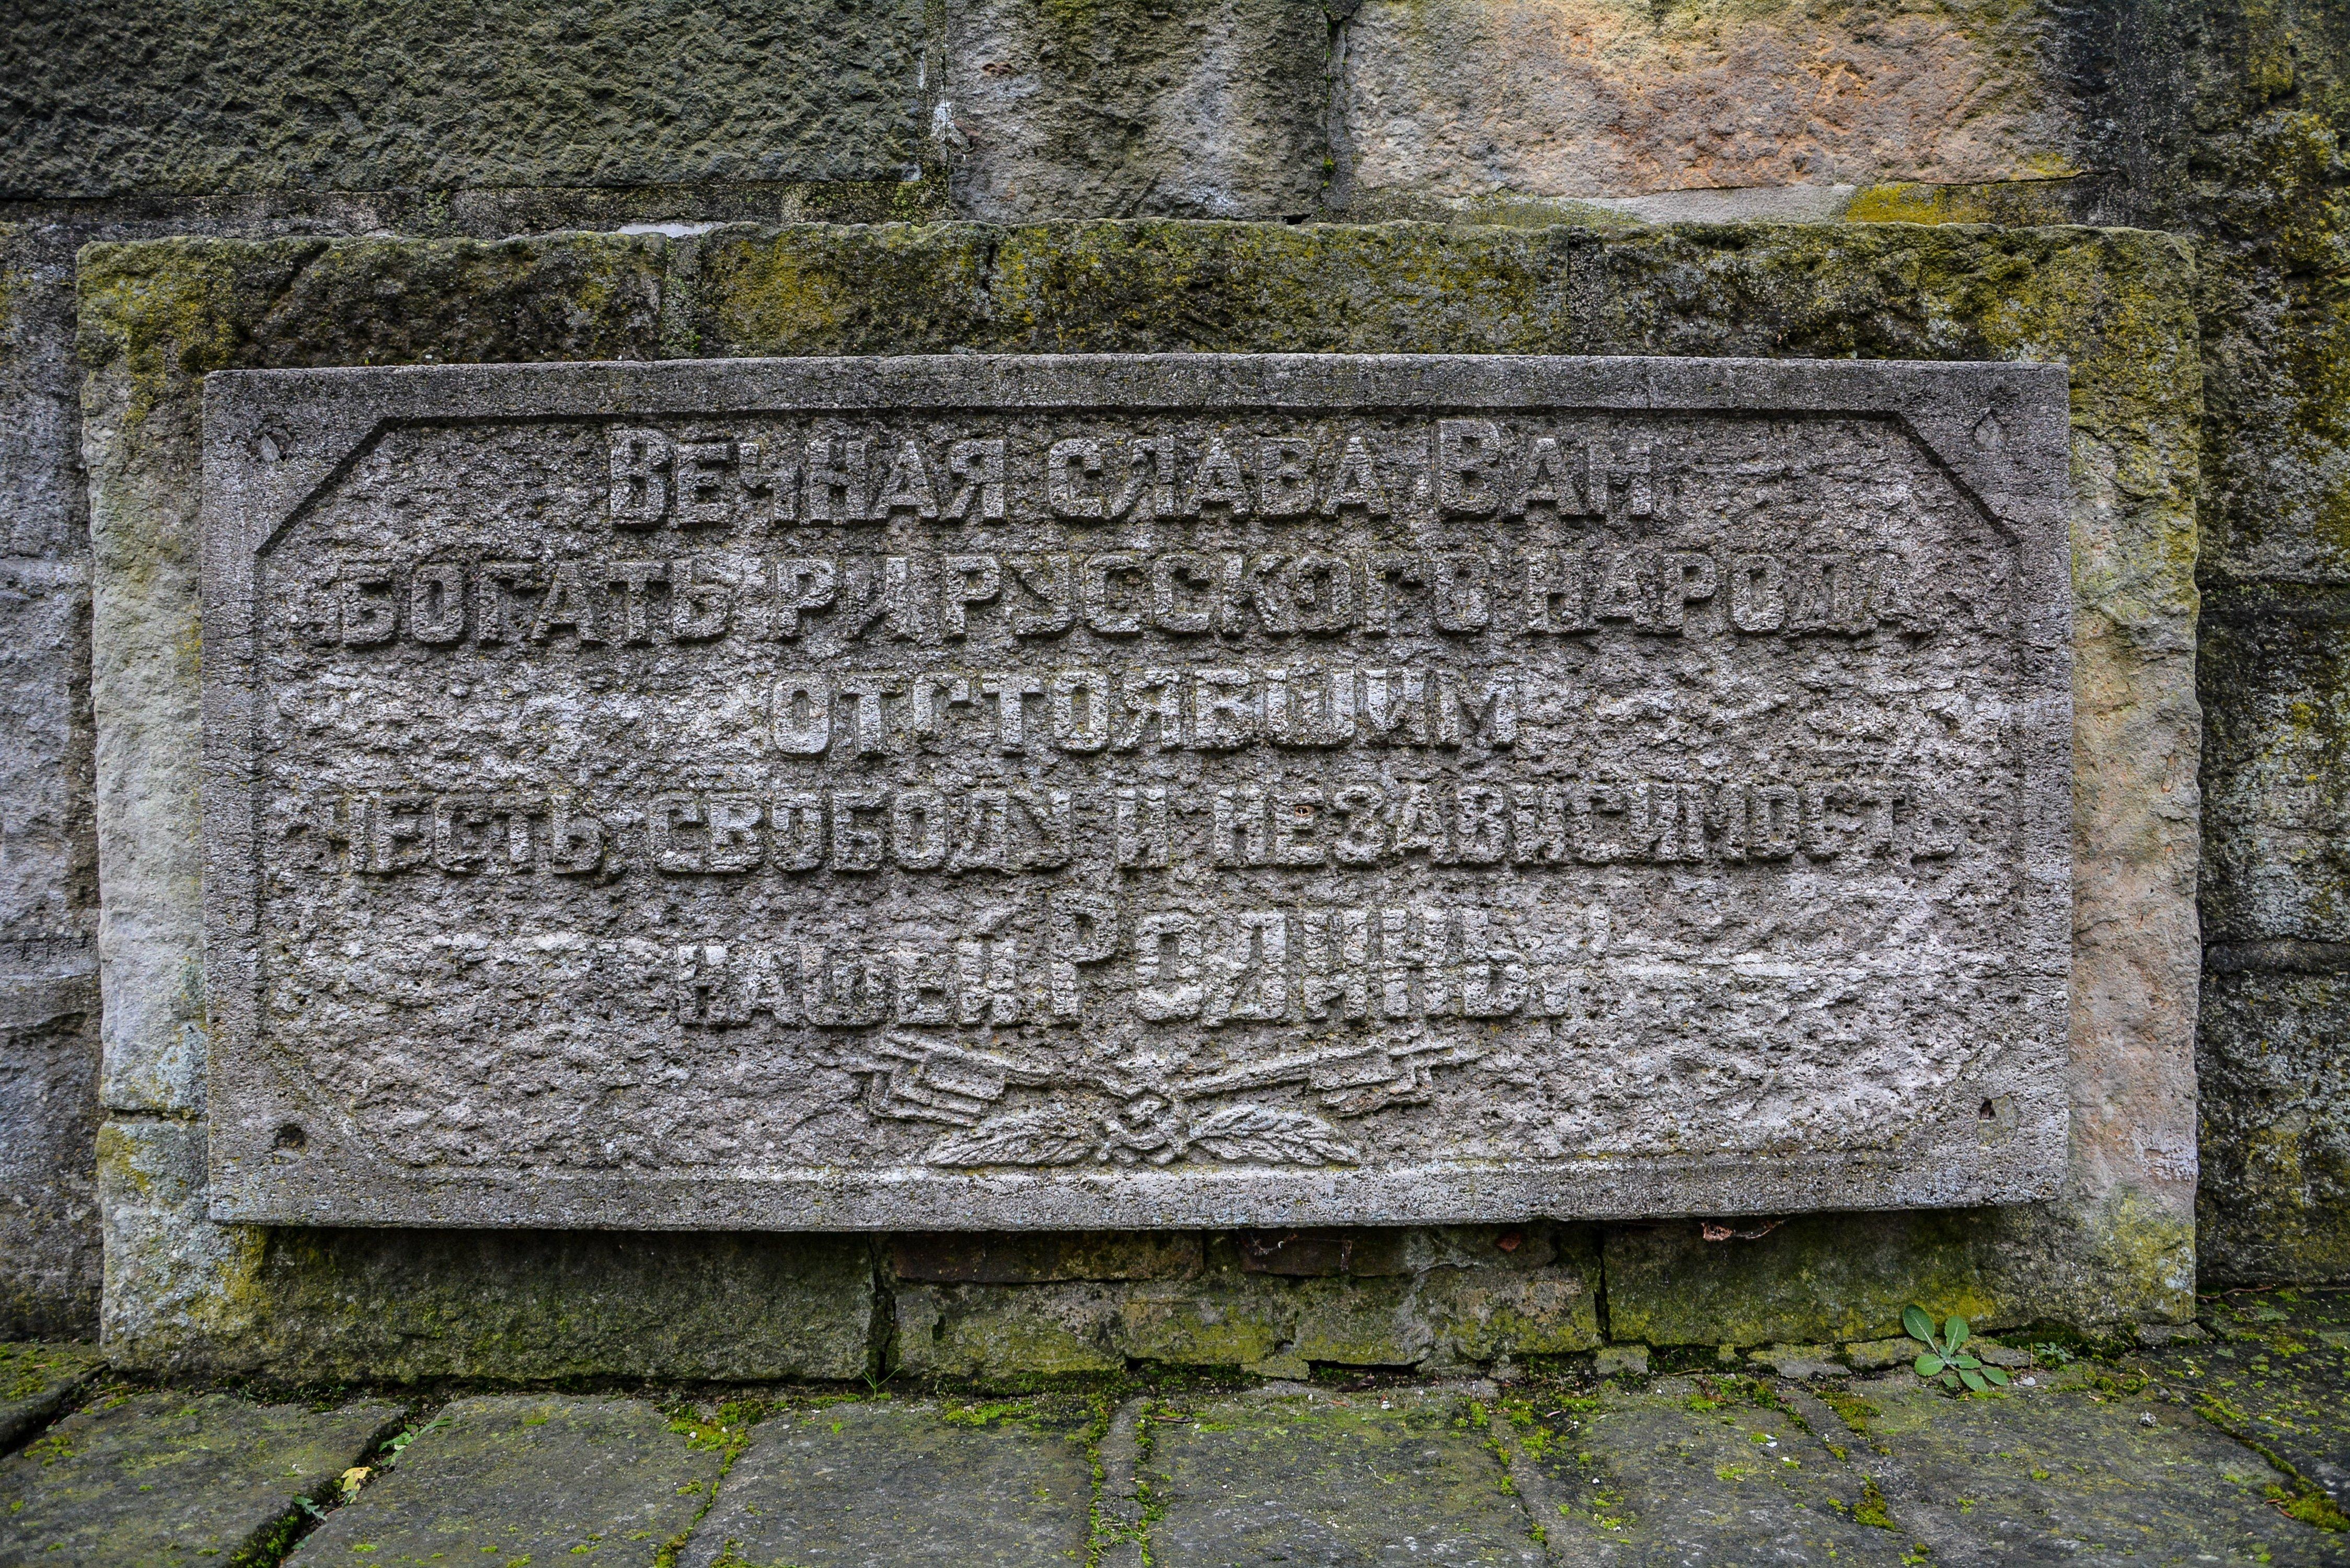 sowjetisches ehrenmal berlin kaulsdorf soviet war memorial berlin kaulsdorf germany deutschland russian panel eternal glory bogatyr